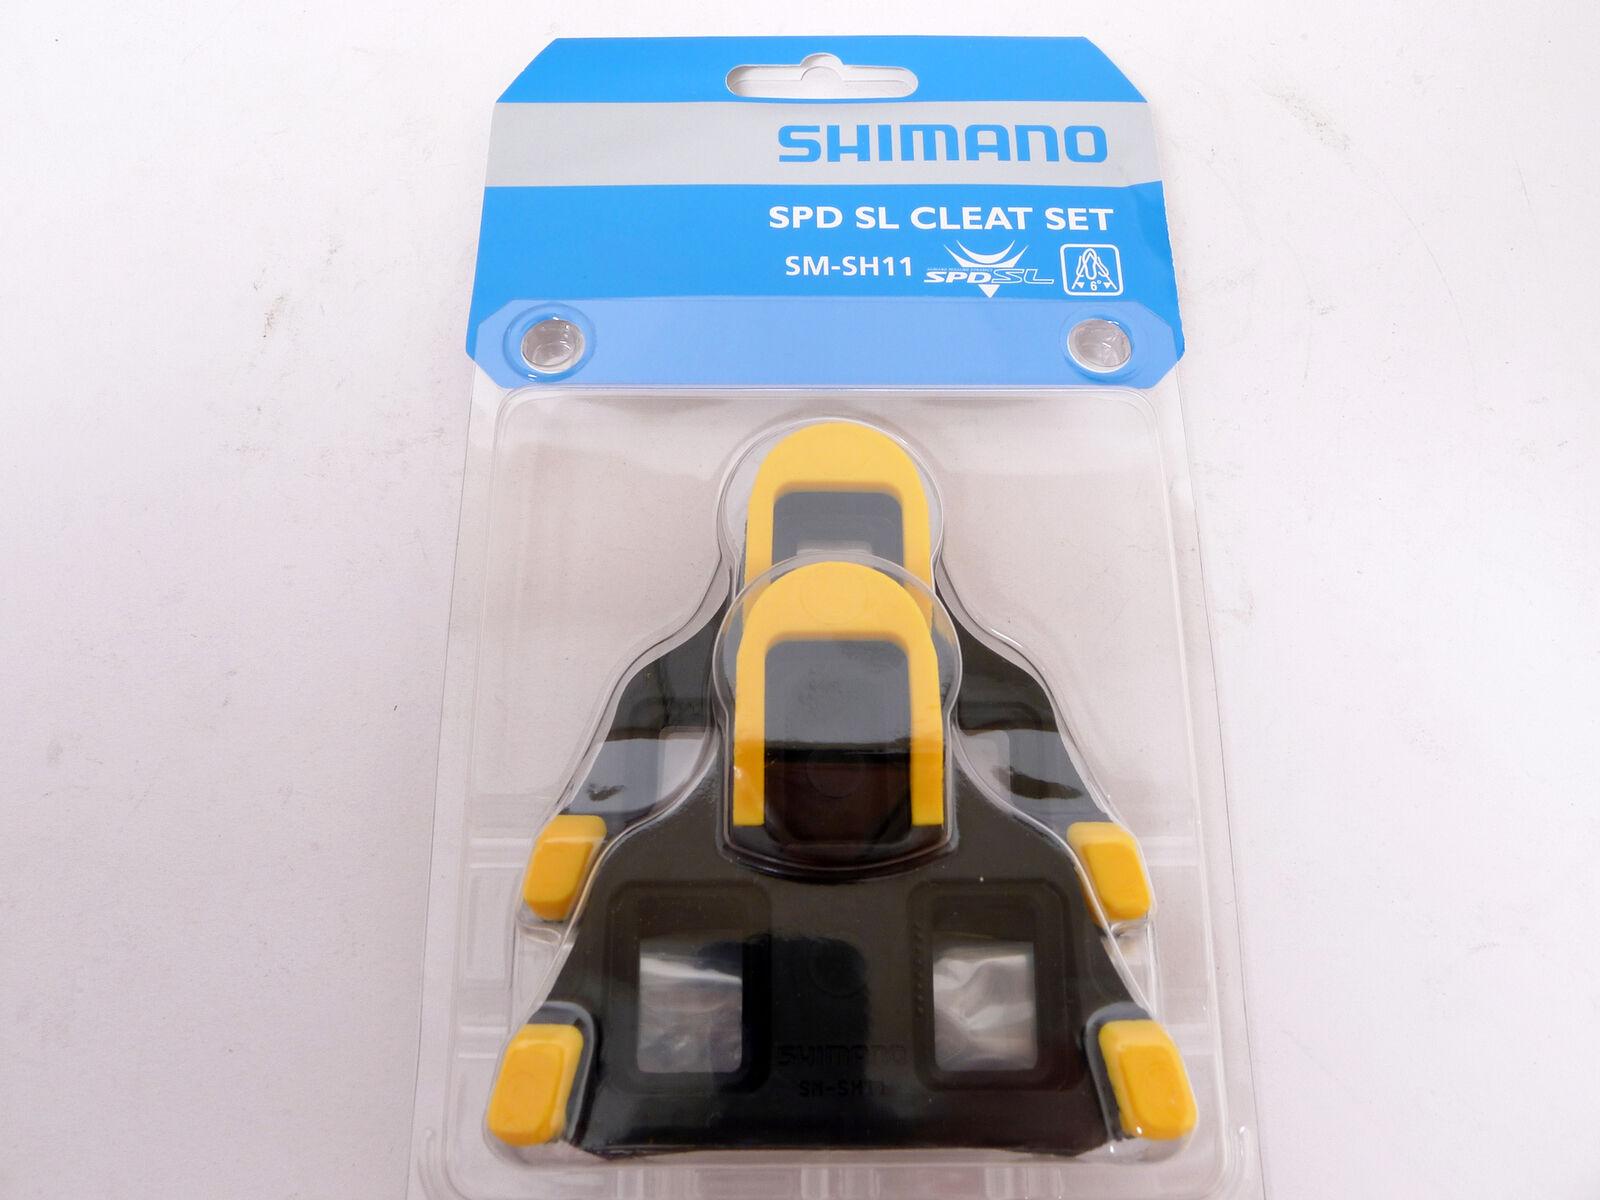 Shimano SPD-SL Road Pedal Cleats 6-degrees Float fits 105 Ultegra SM-SH11